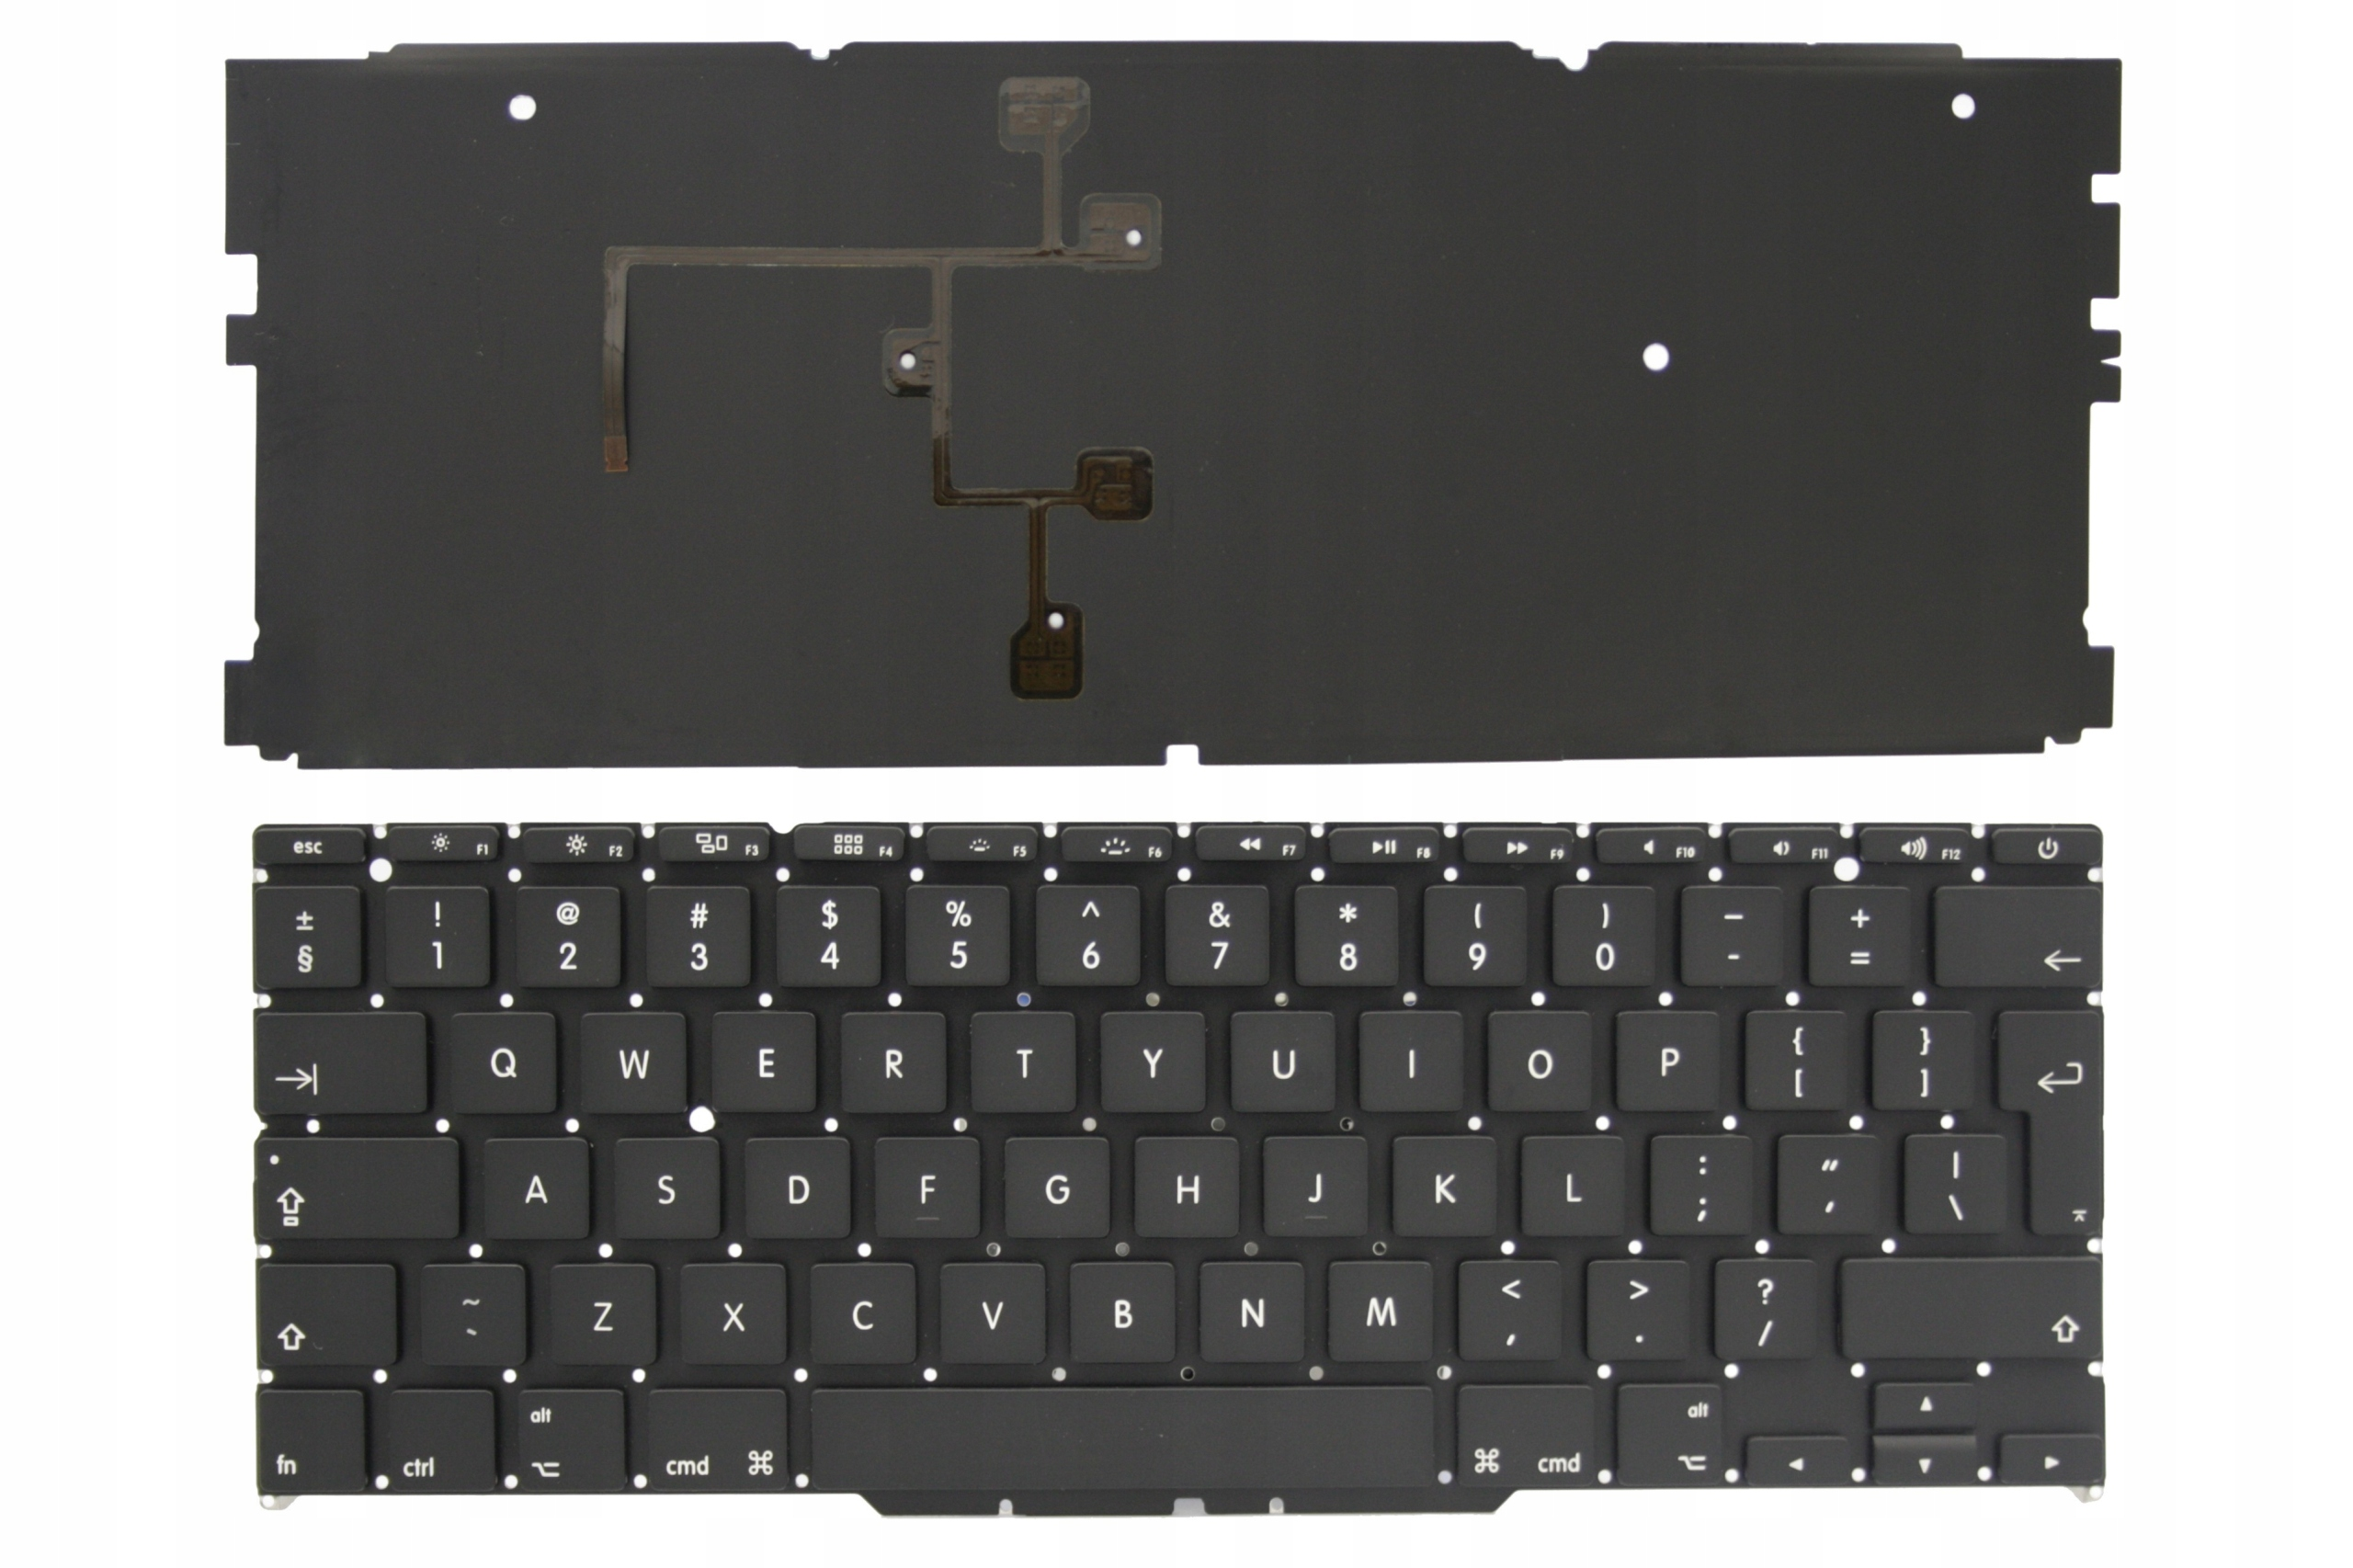 KLAWIATURA APPLE MACBOOK A1370 A1465 - Klawiatury do laptopów